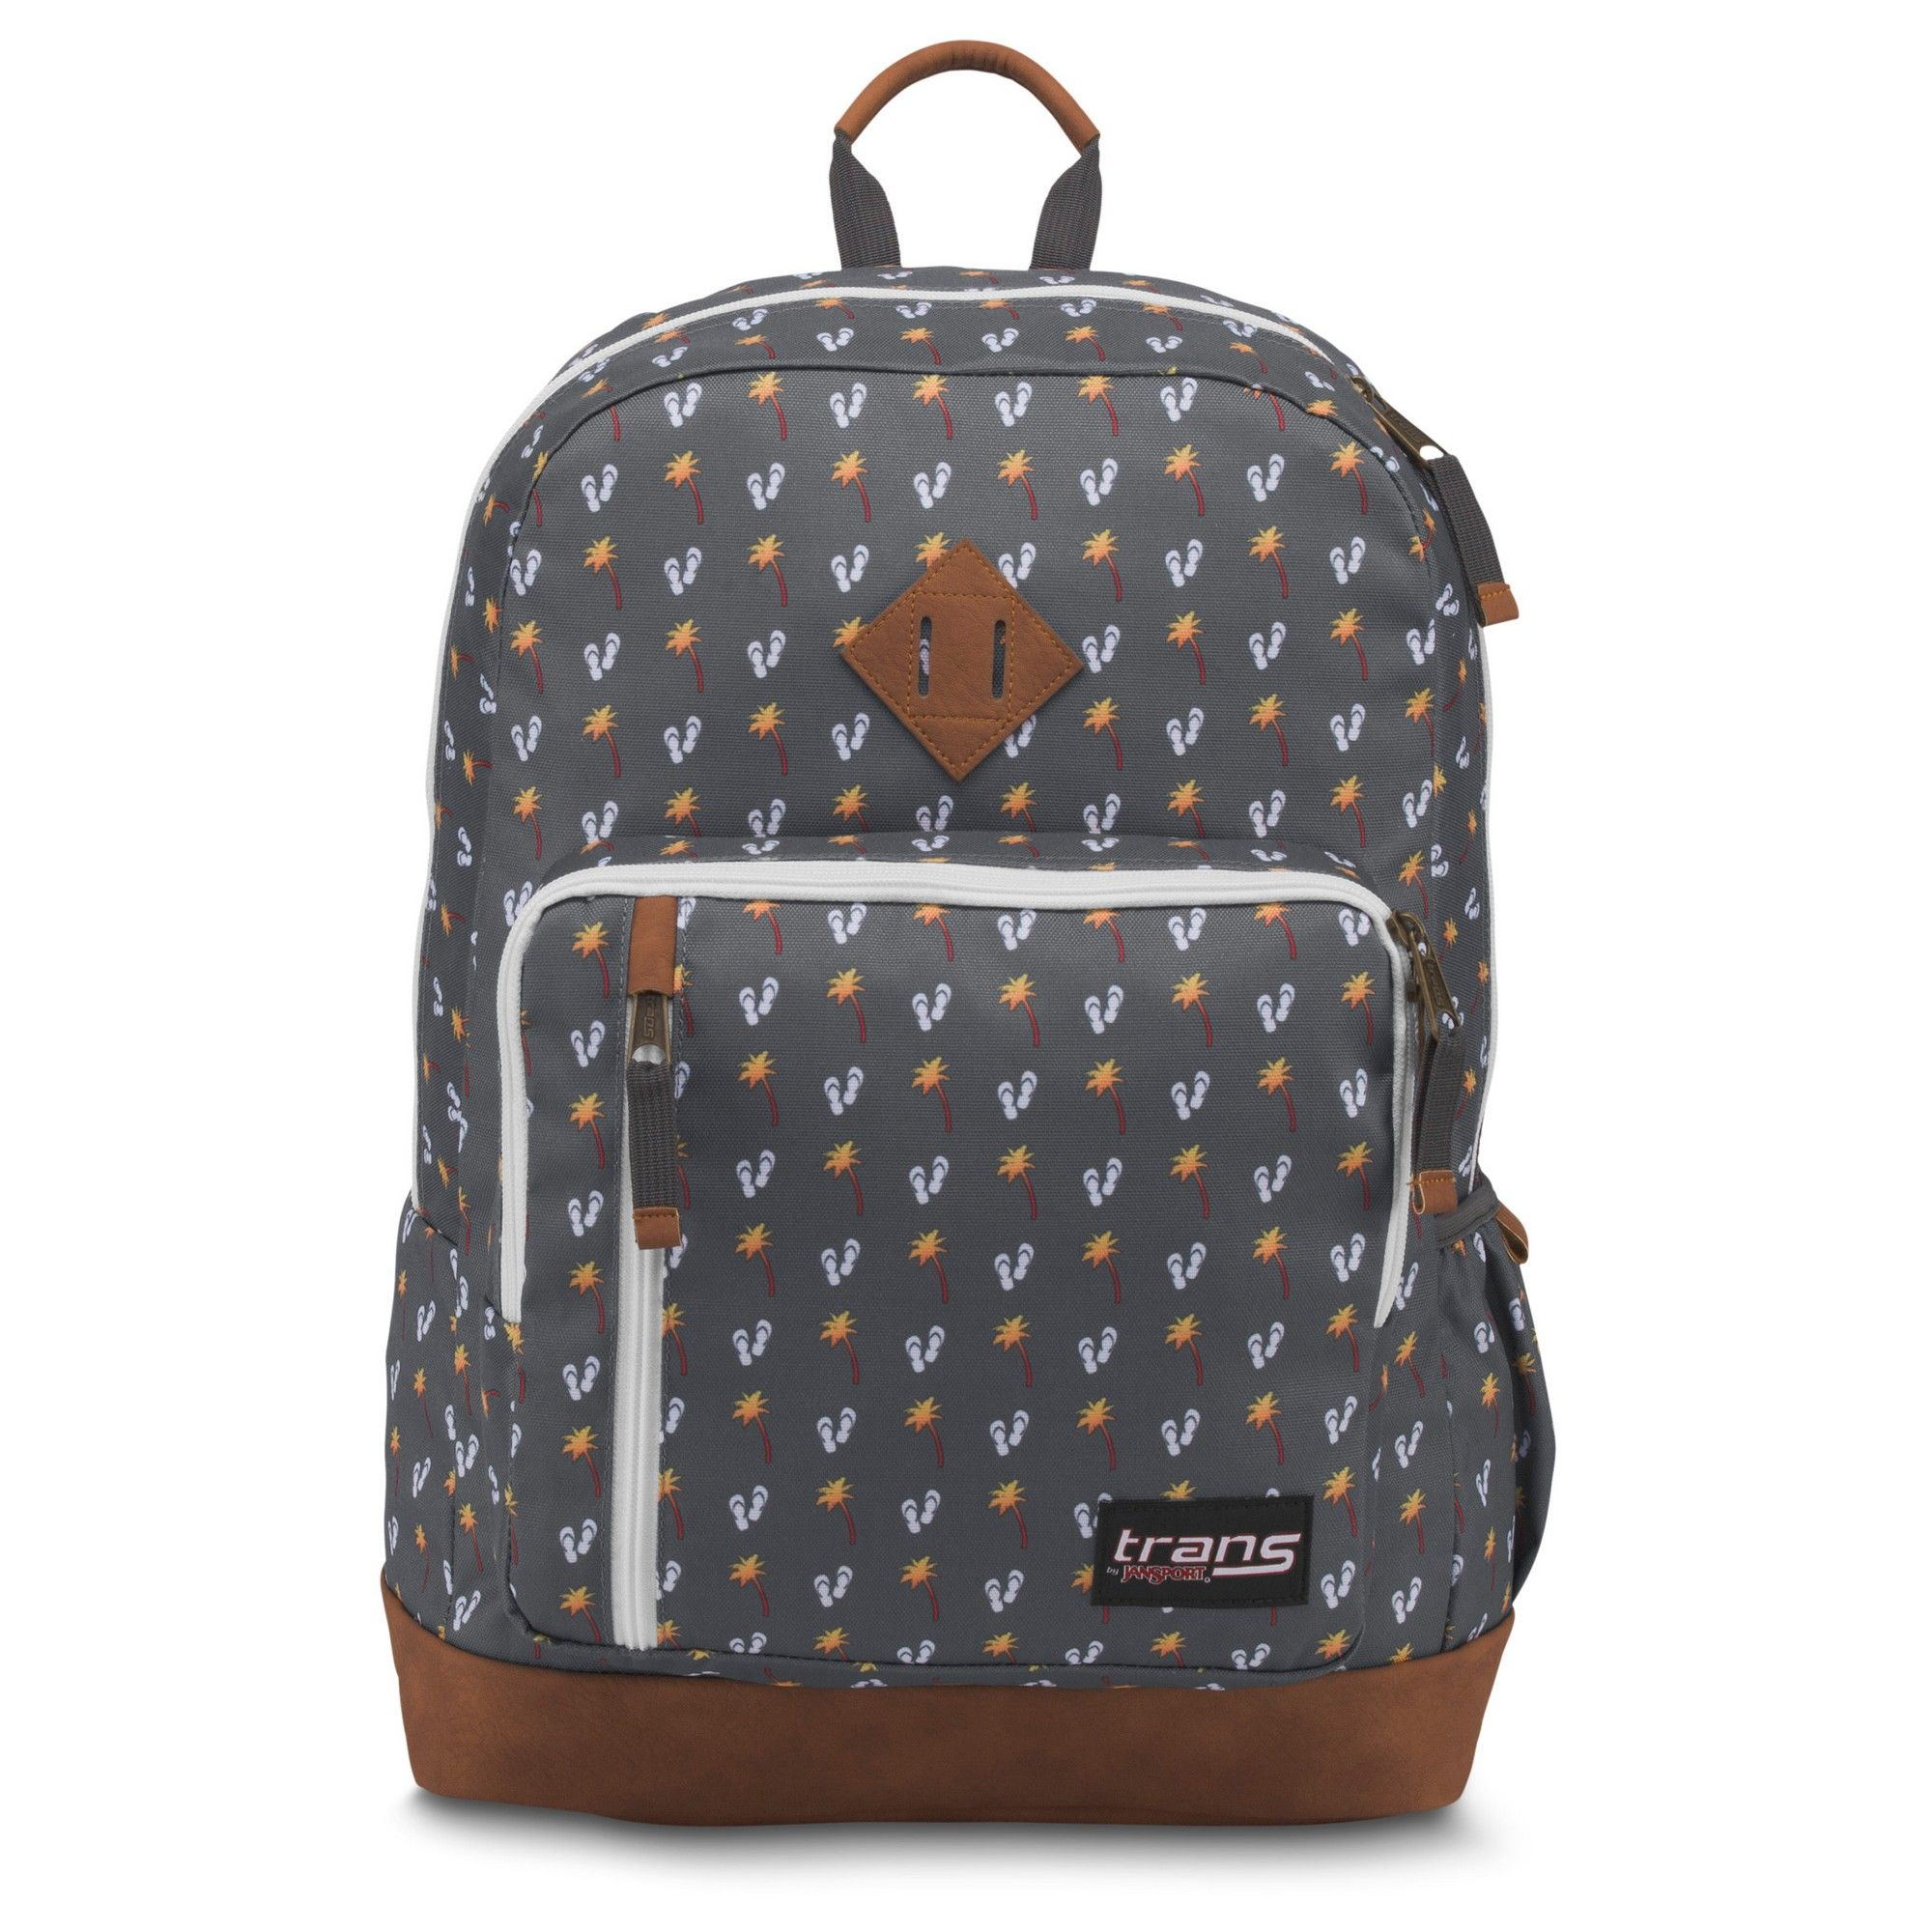 5c94e75b6870 Jansport Floral Backpack Target- Fenix Toulouse Handball